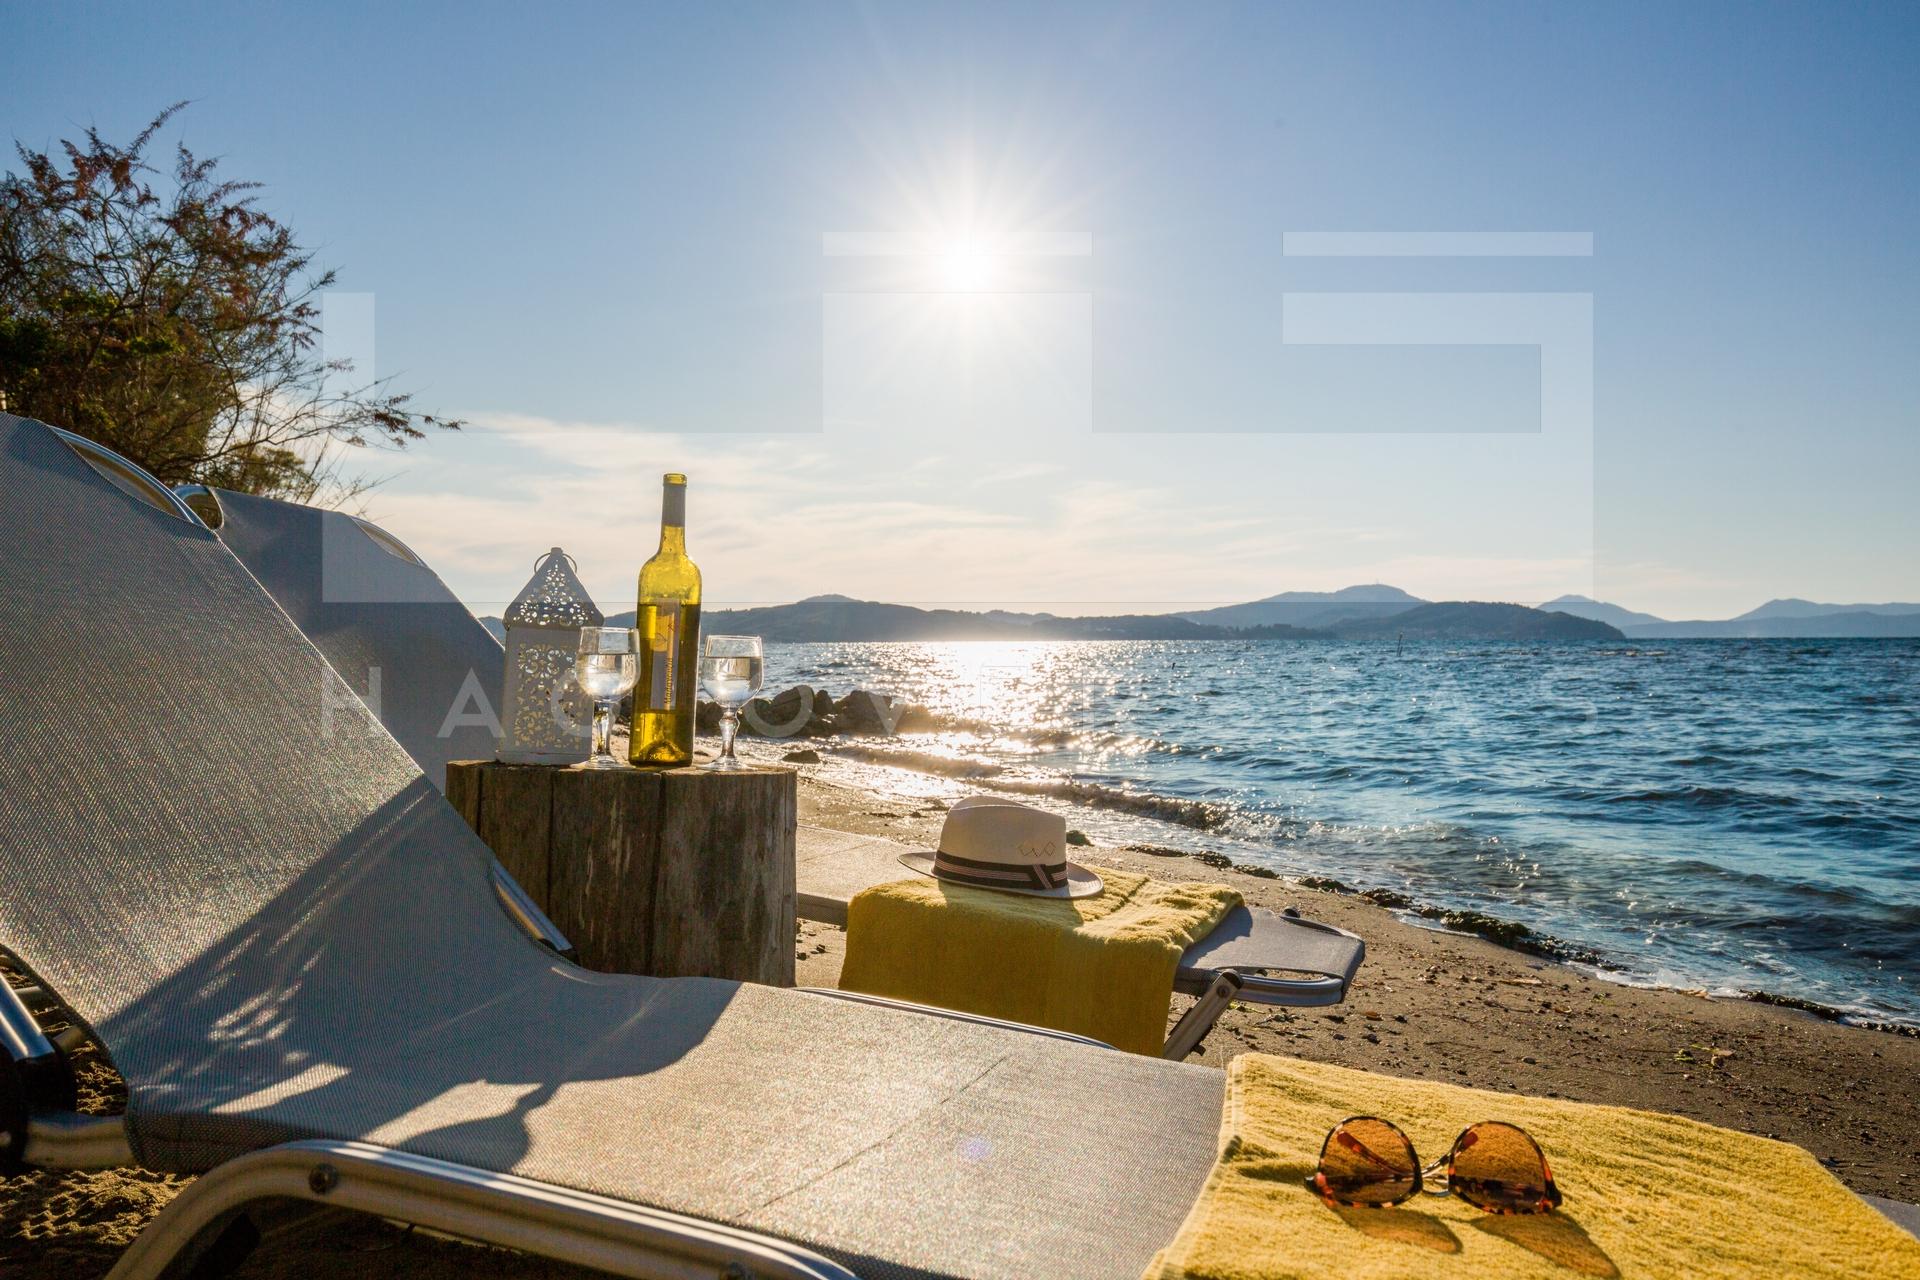 Property For Sale Corfu 2 Bedroom House Through Haq Overseas Ltd